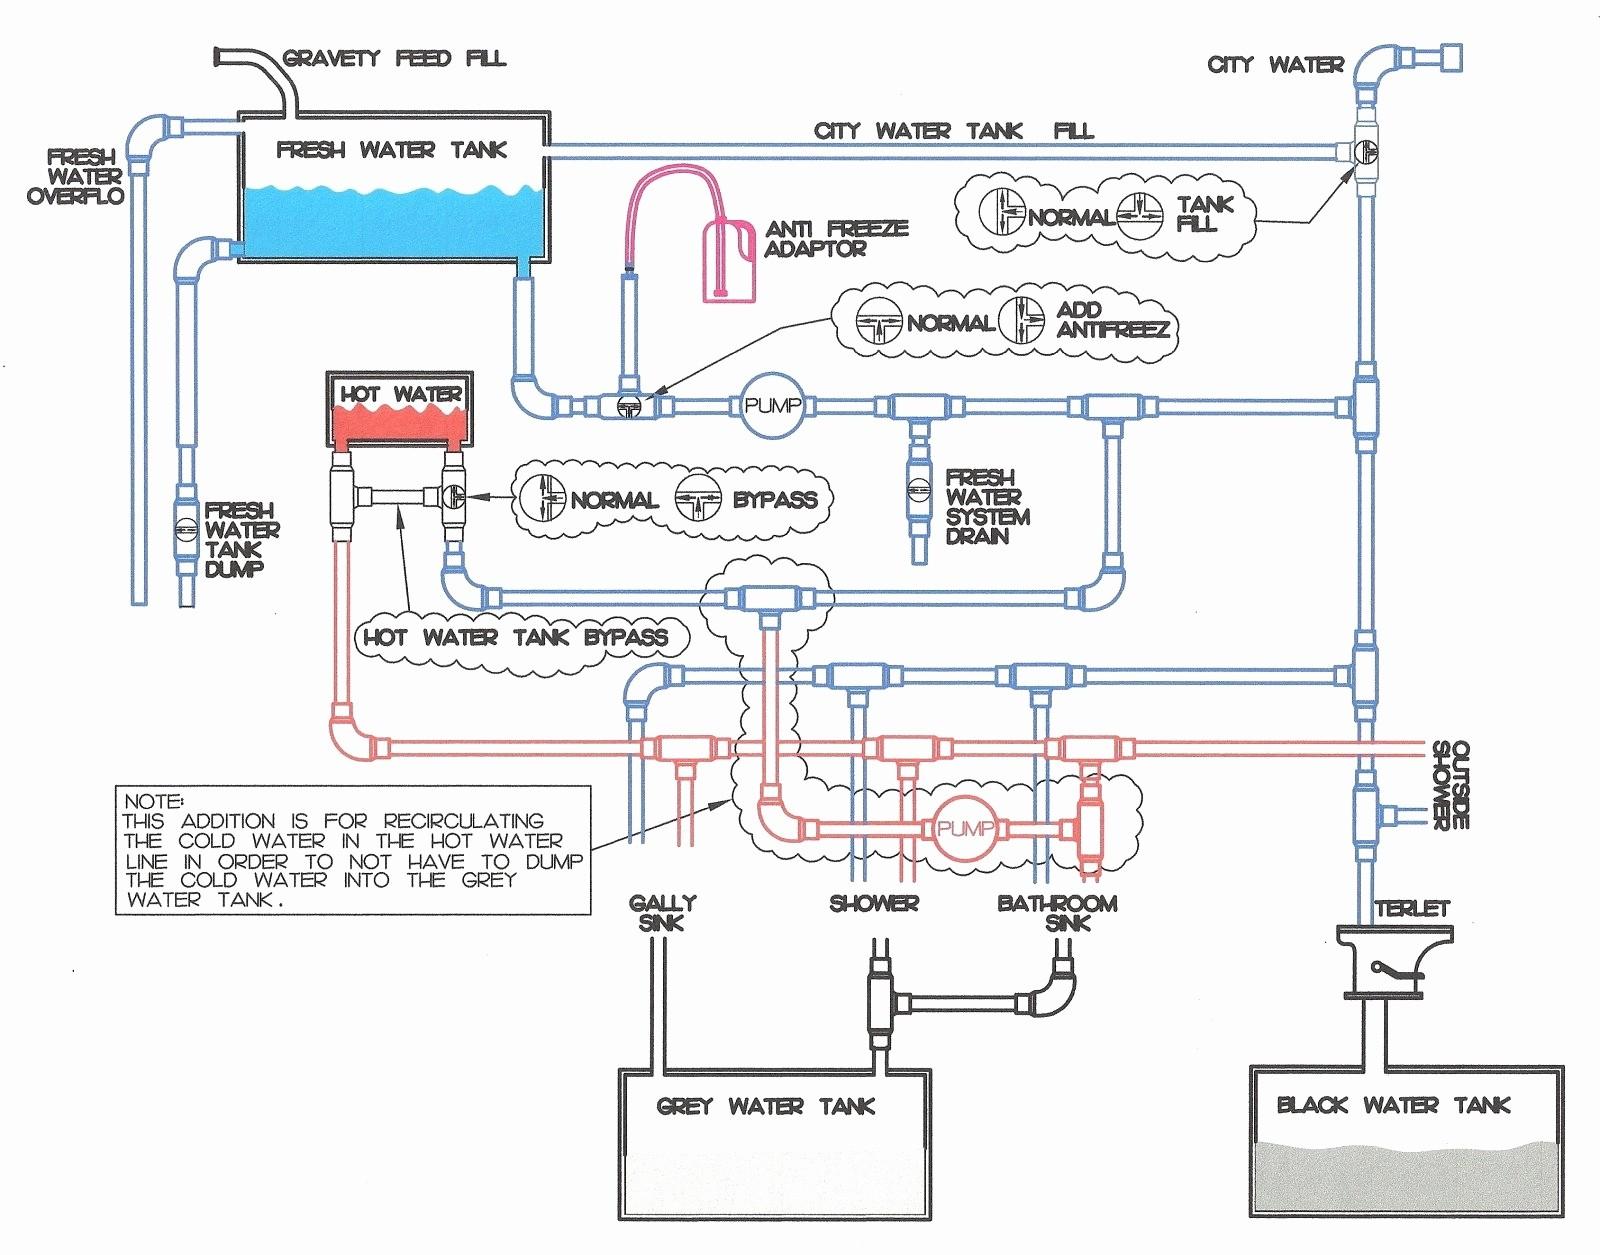 hight resolution of keystone rv wiring diagram collection keystone rv floor plans beautiful keystone rv floor plans best download wiring diagram